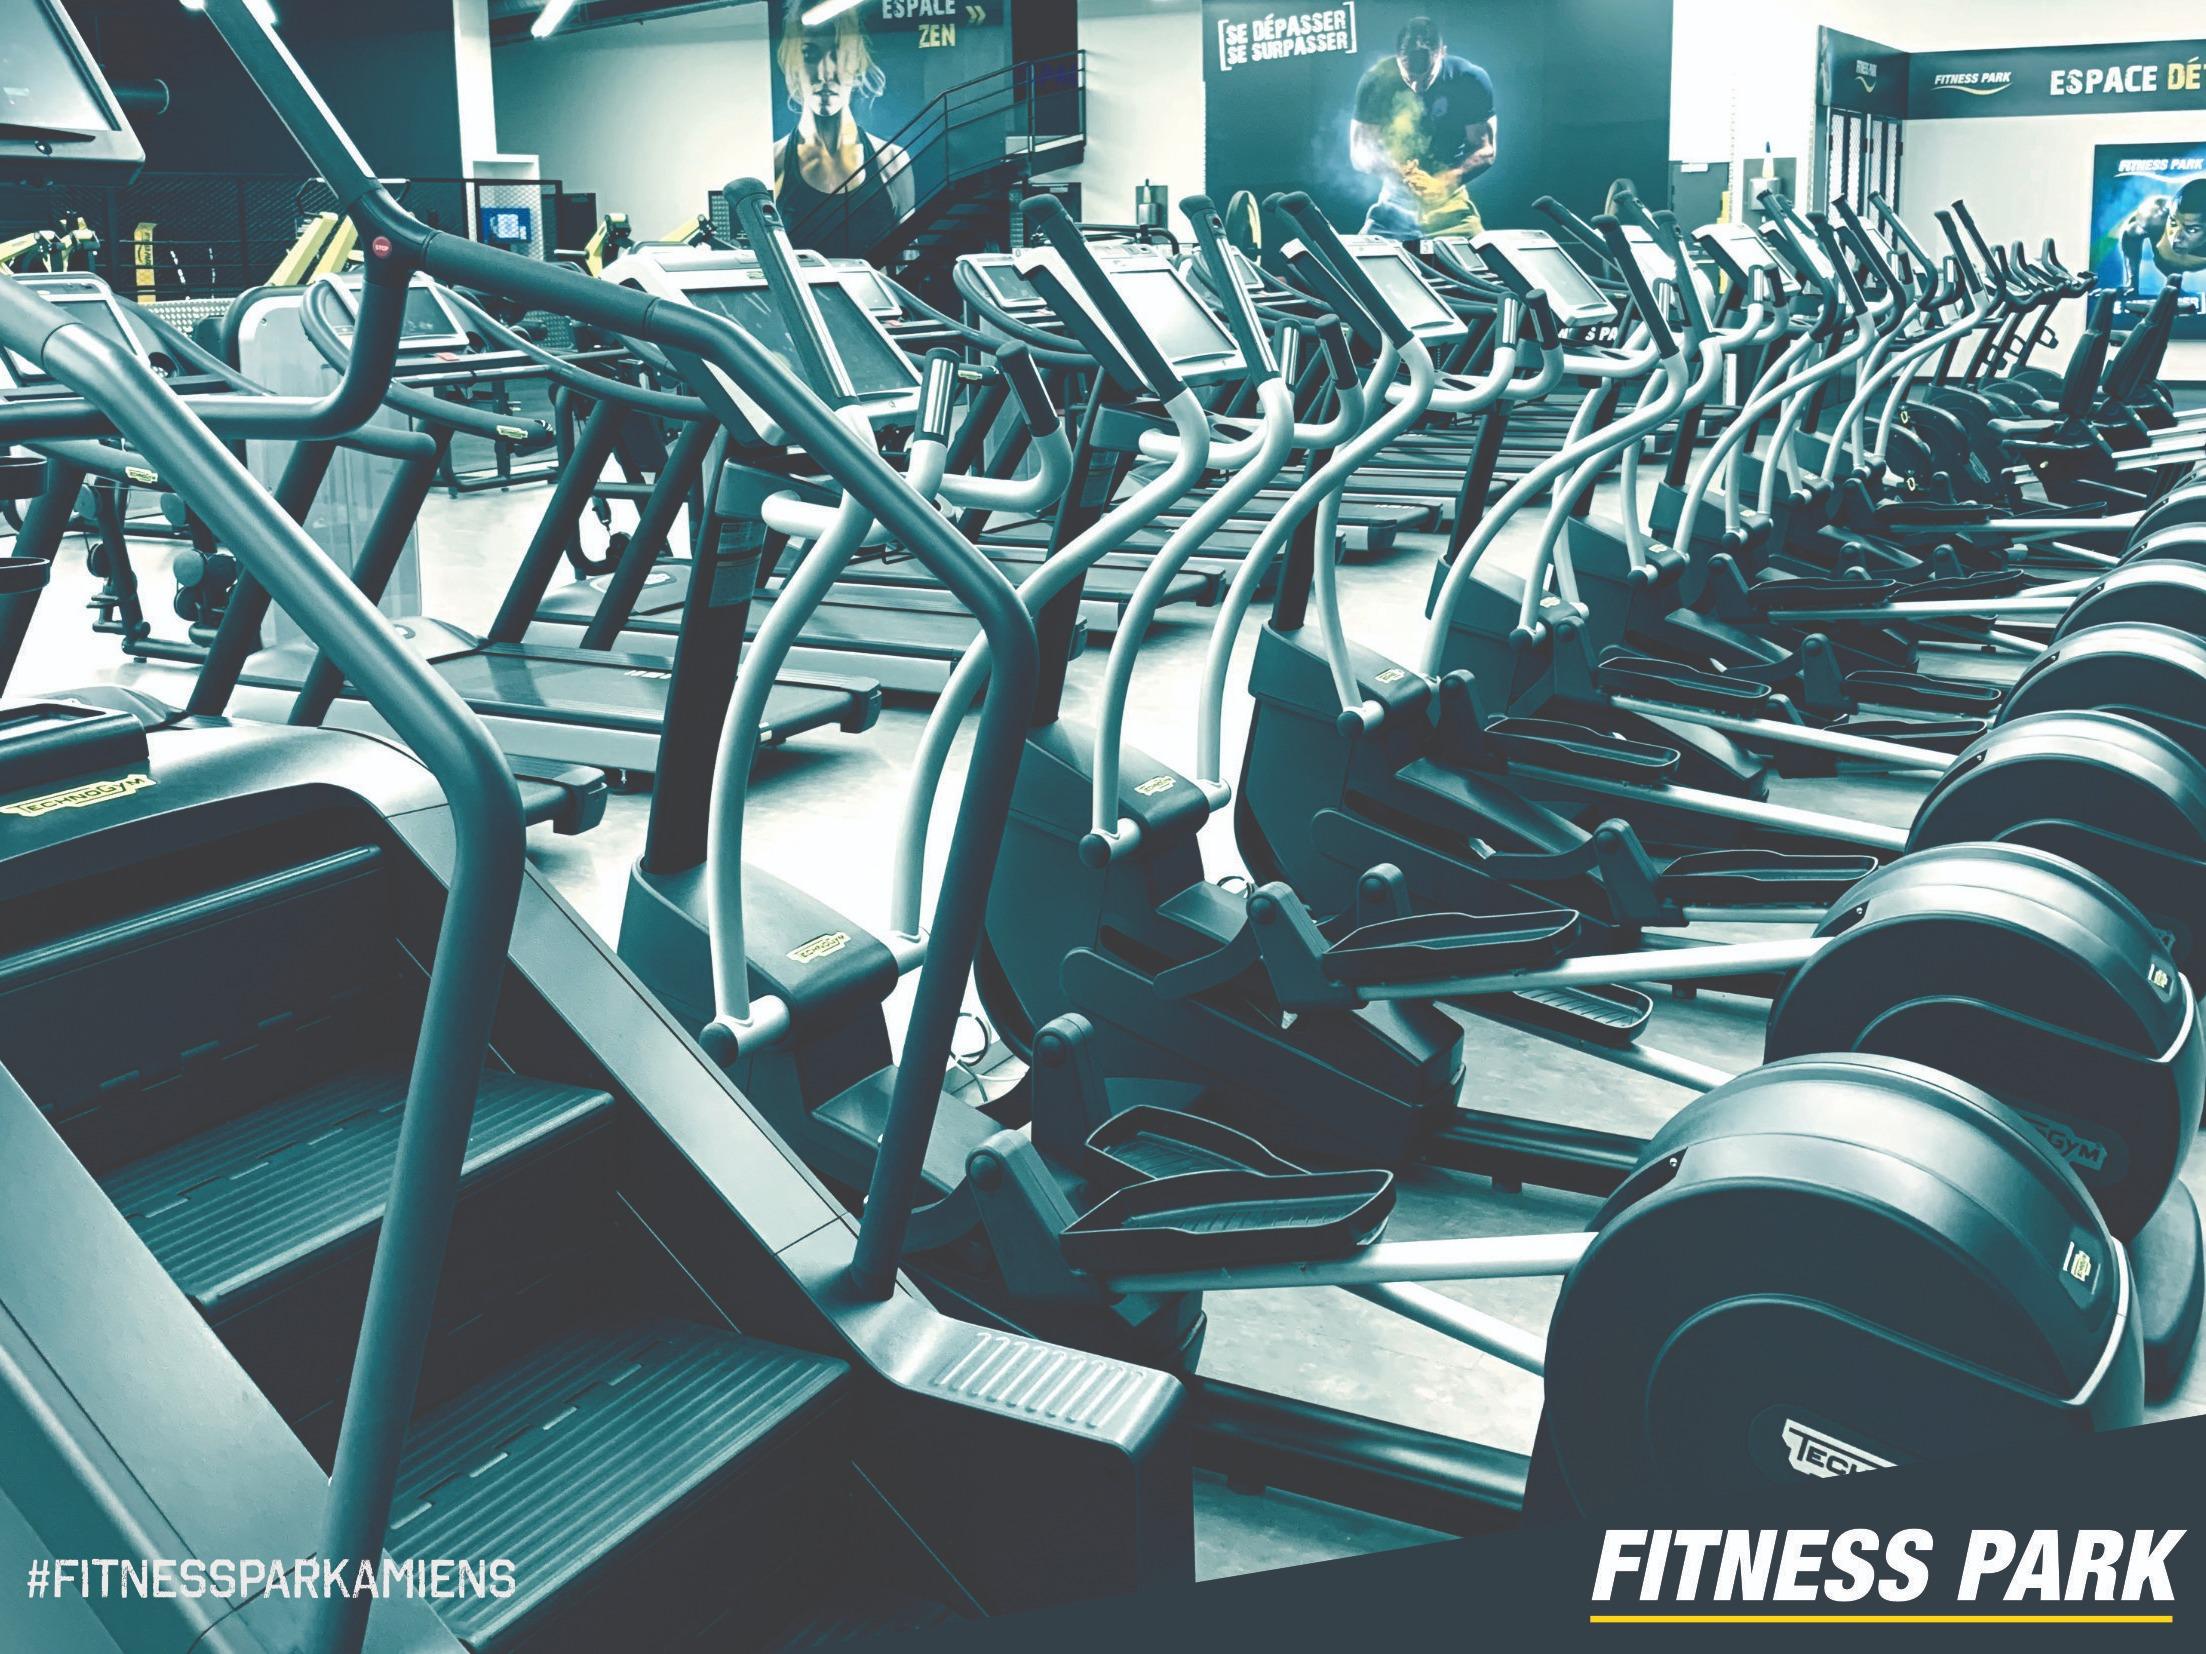 Fitness Park Amiens - Europe